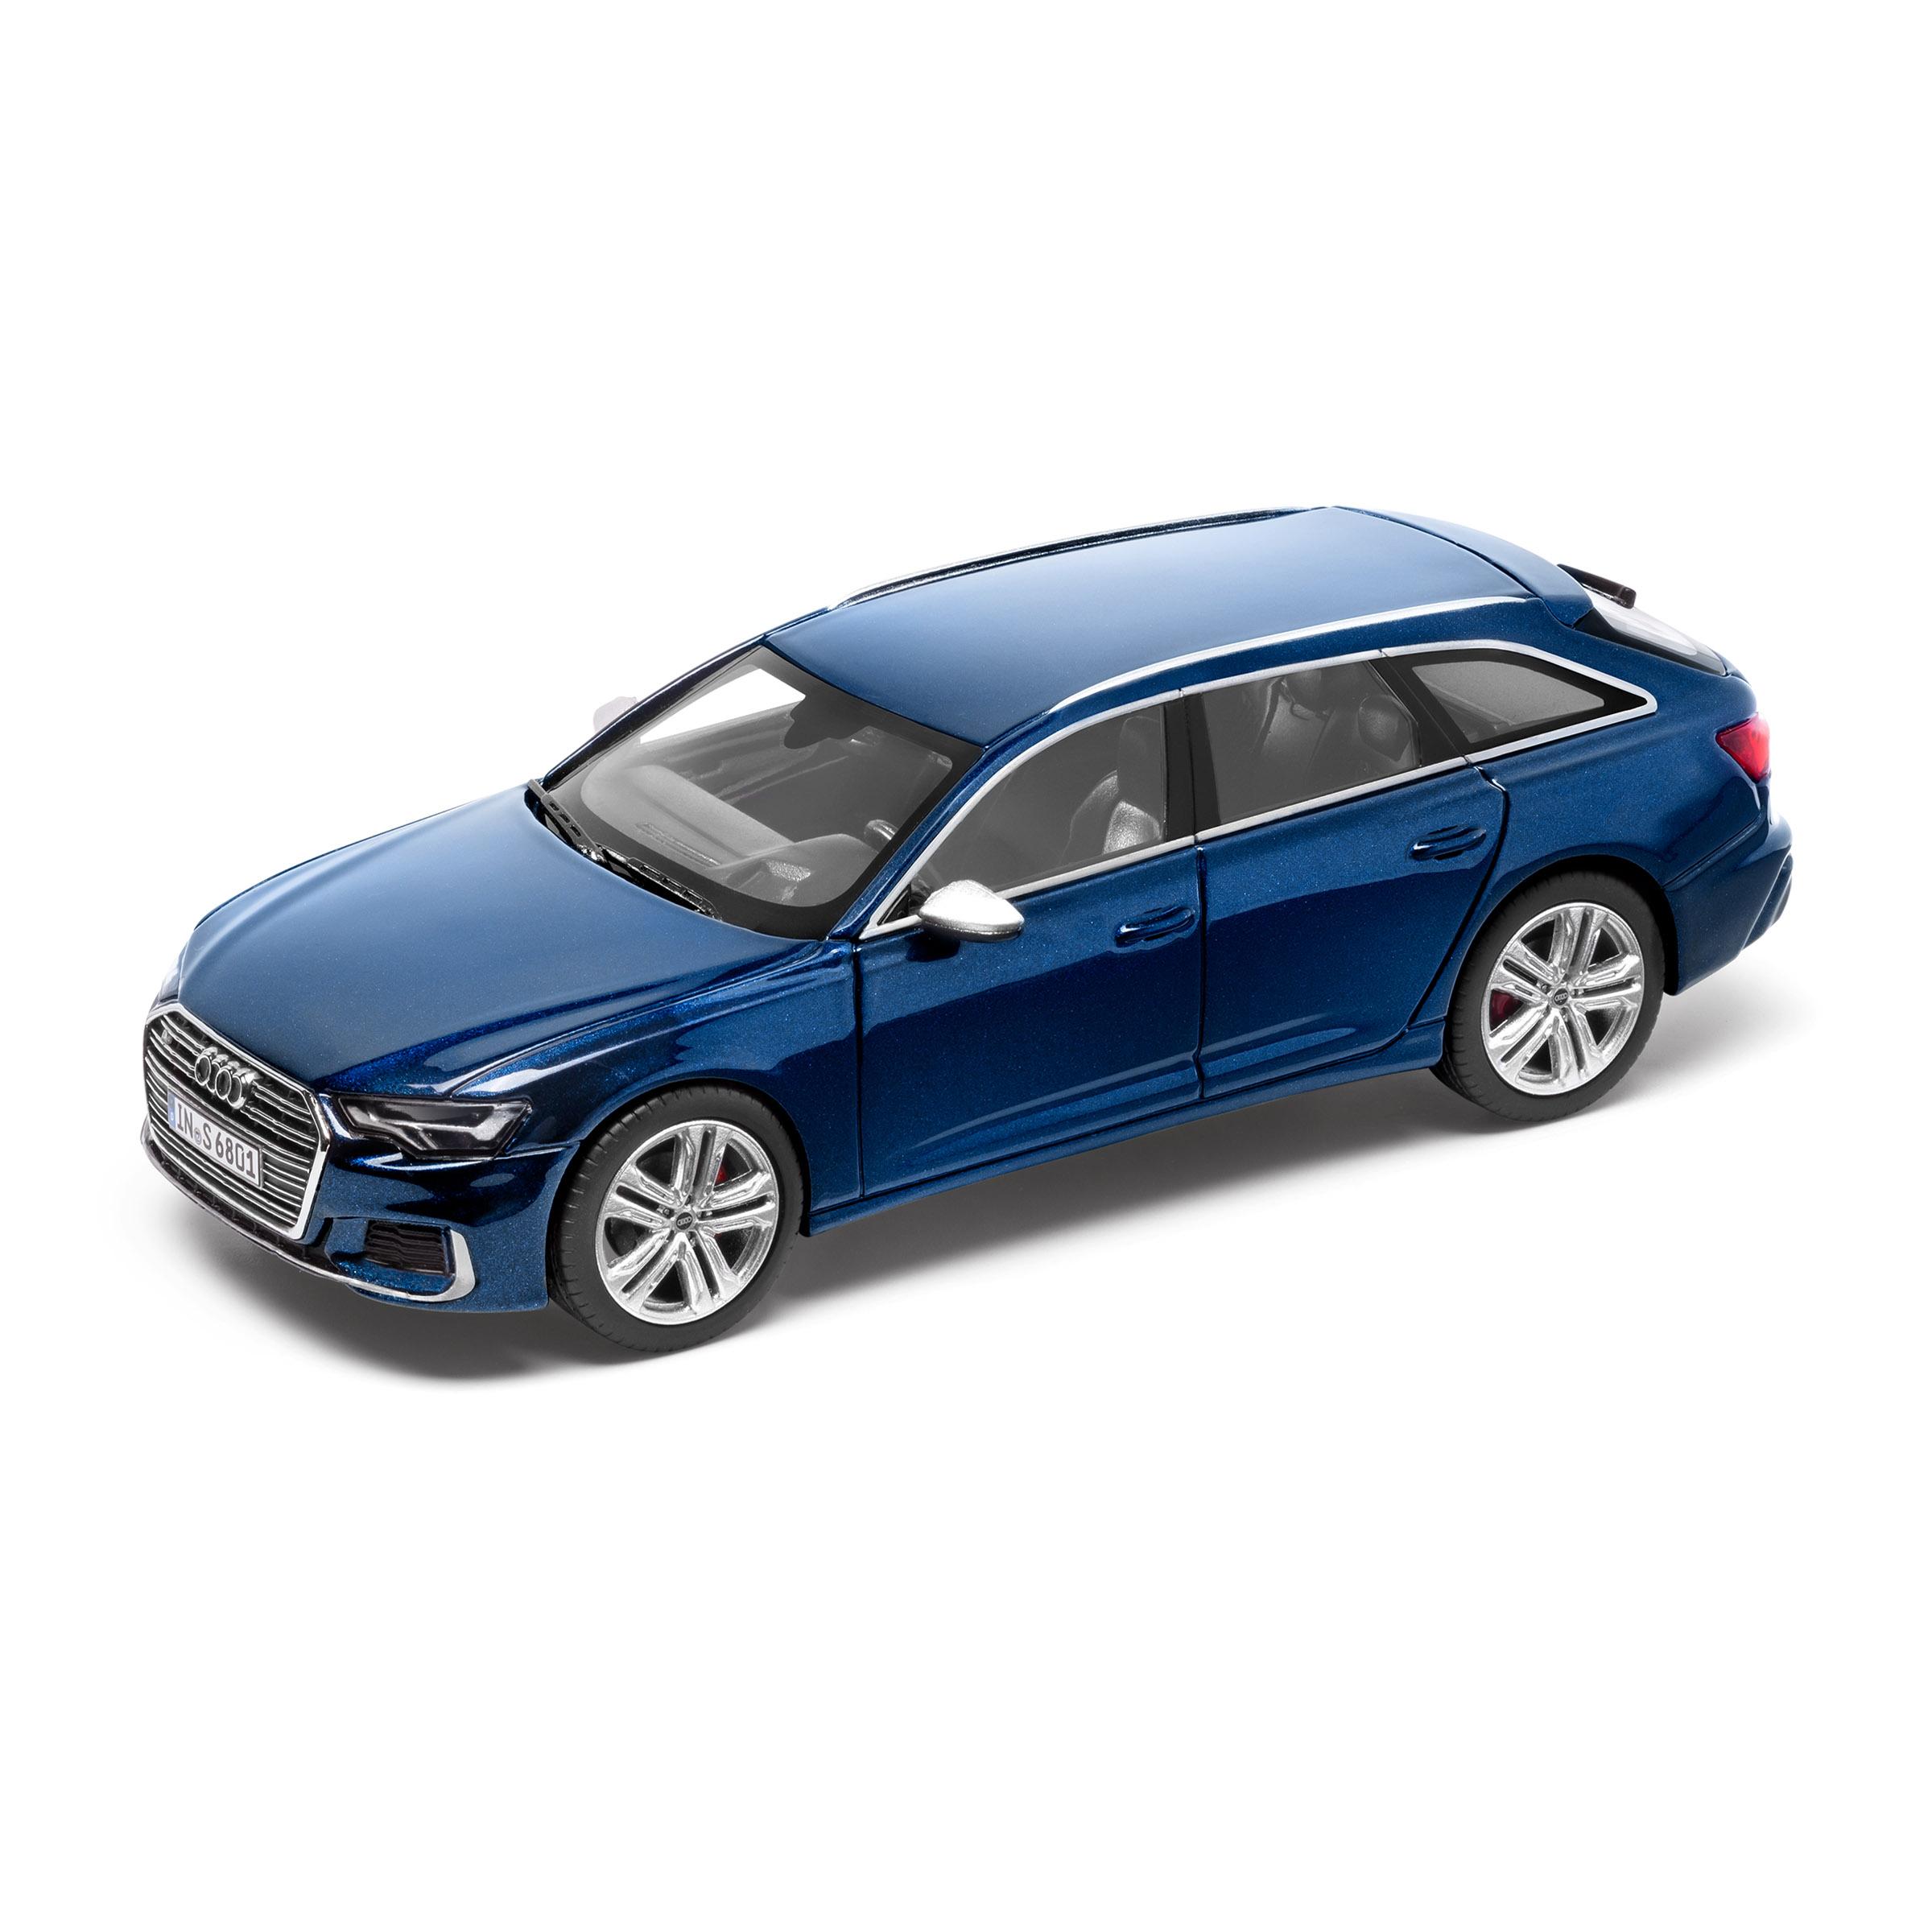 Audi S6 Avant limitiert Navarrablau 1:43